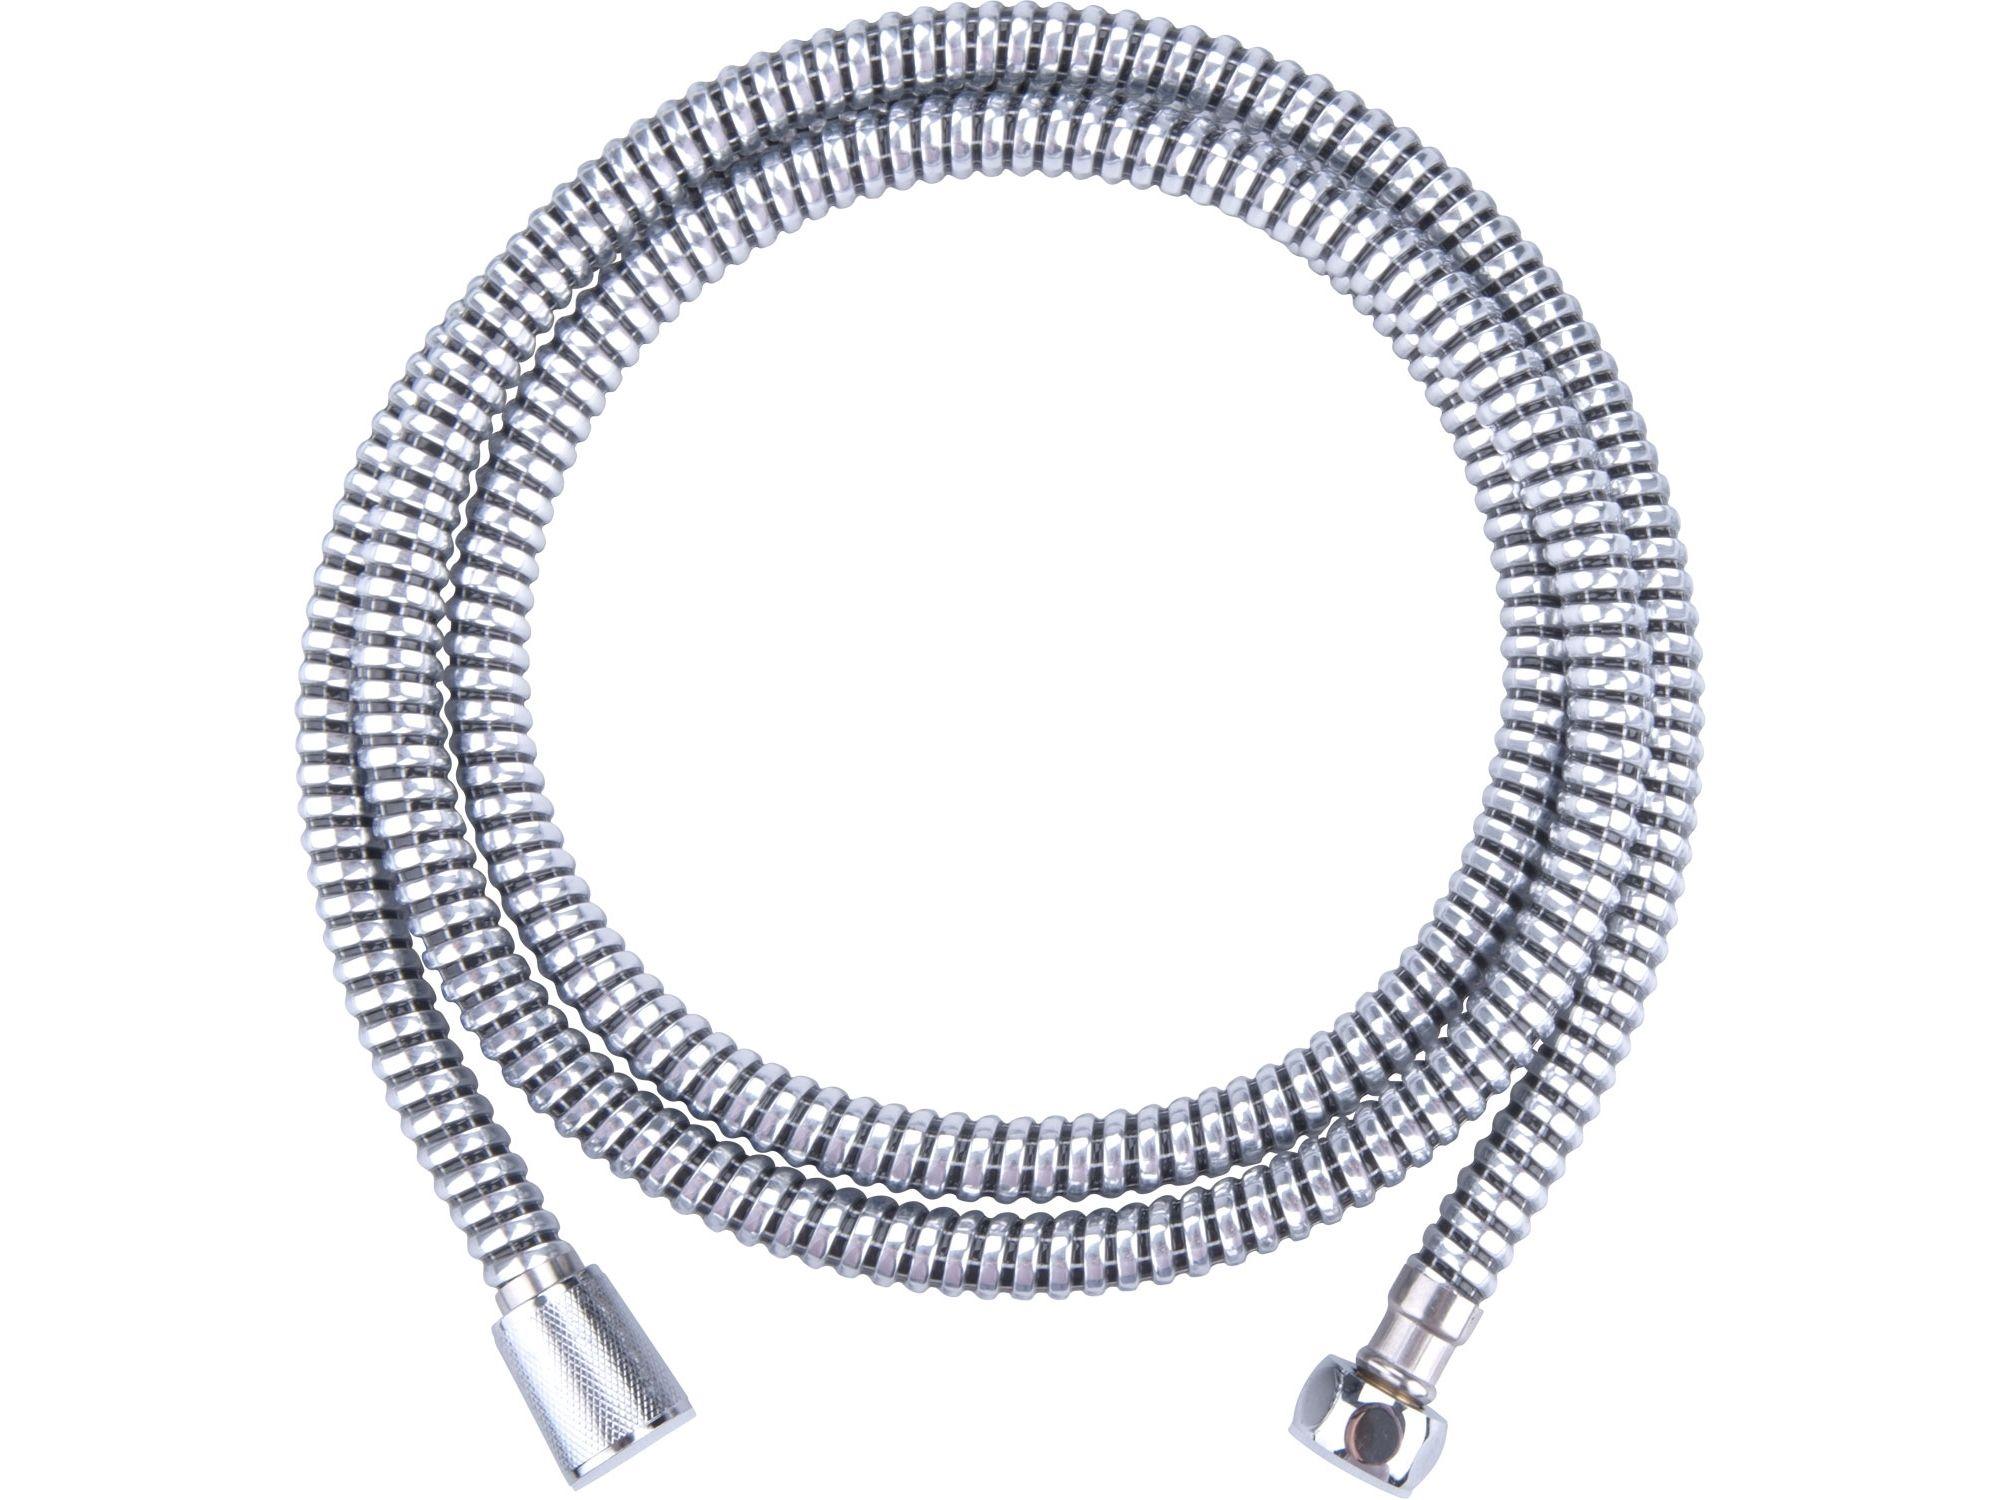 Hadice sprchová, černo/stříbrná, 180cm, PVC FRESHHH